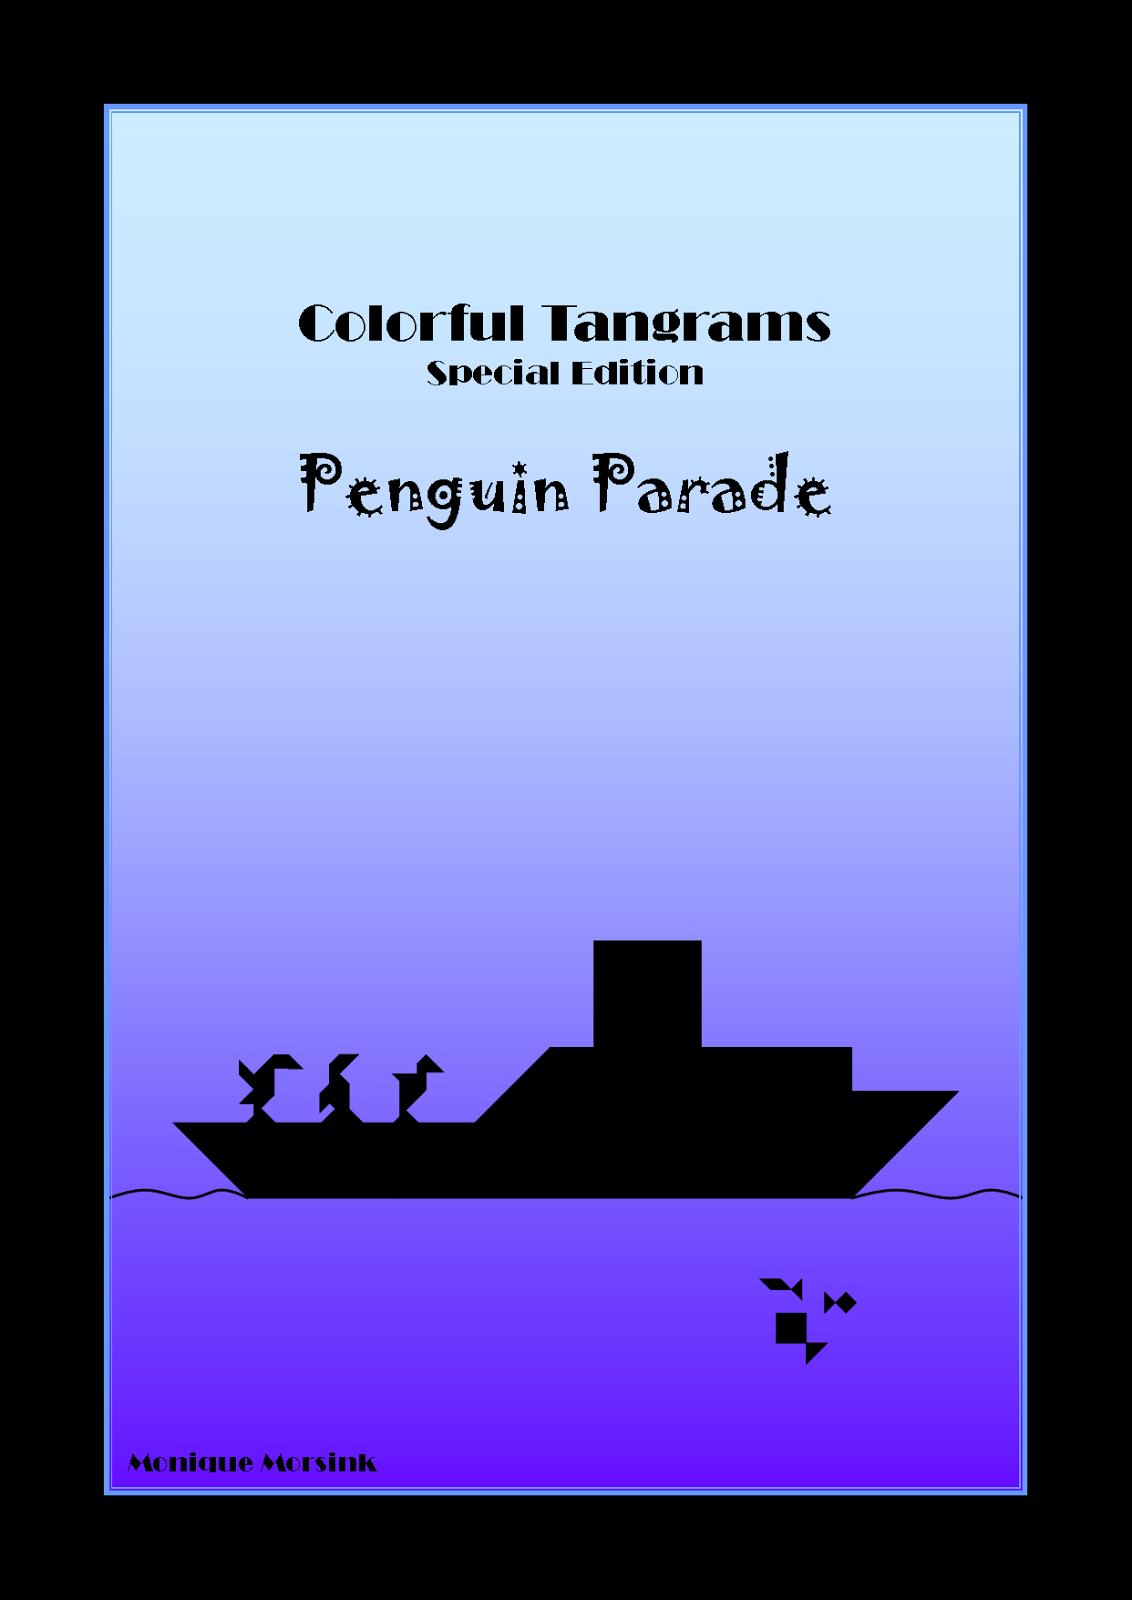 Colorful Tangrams Penguin Parade